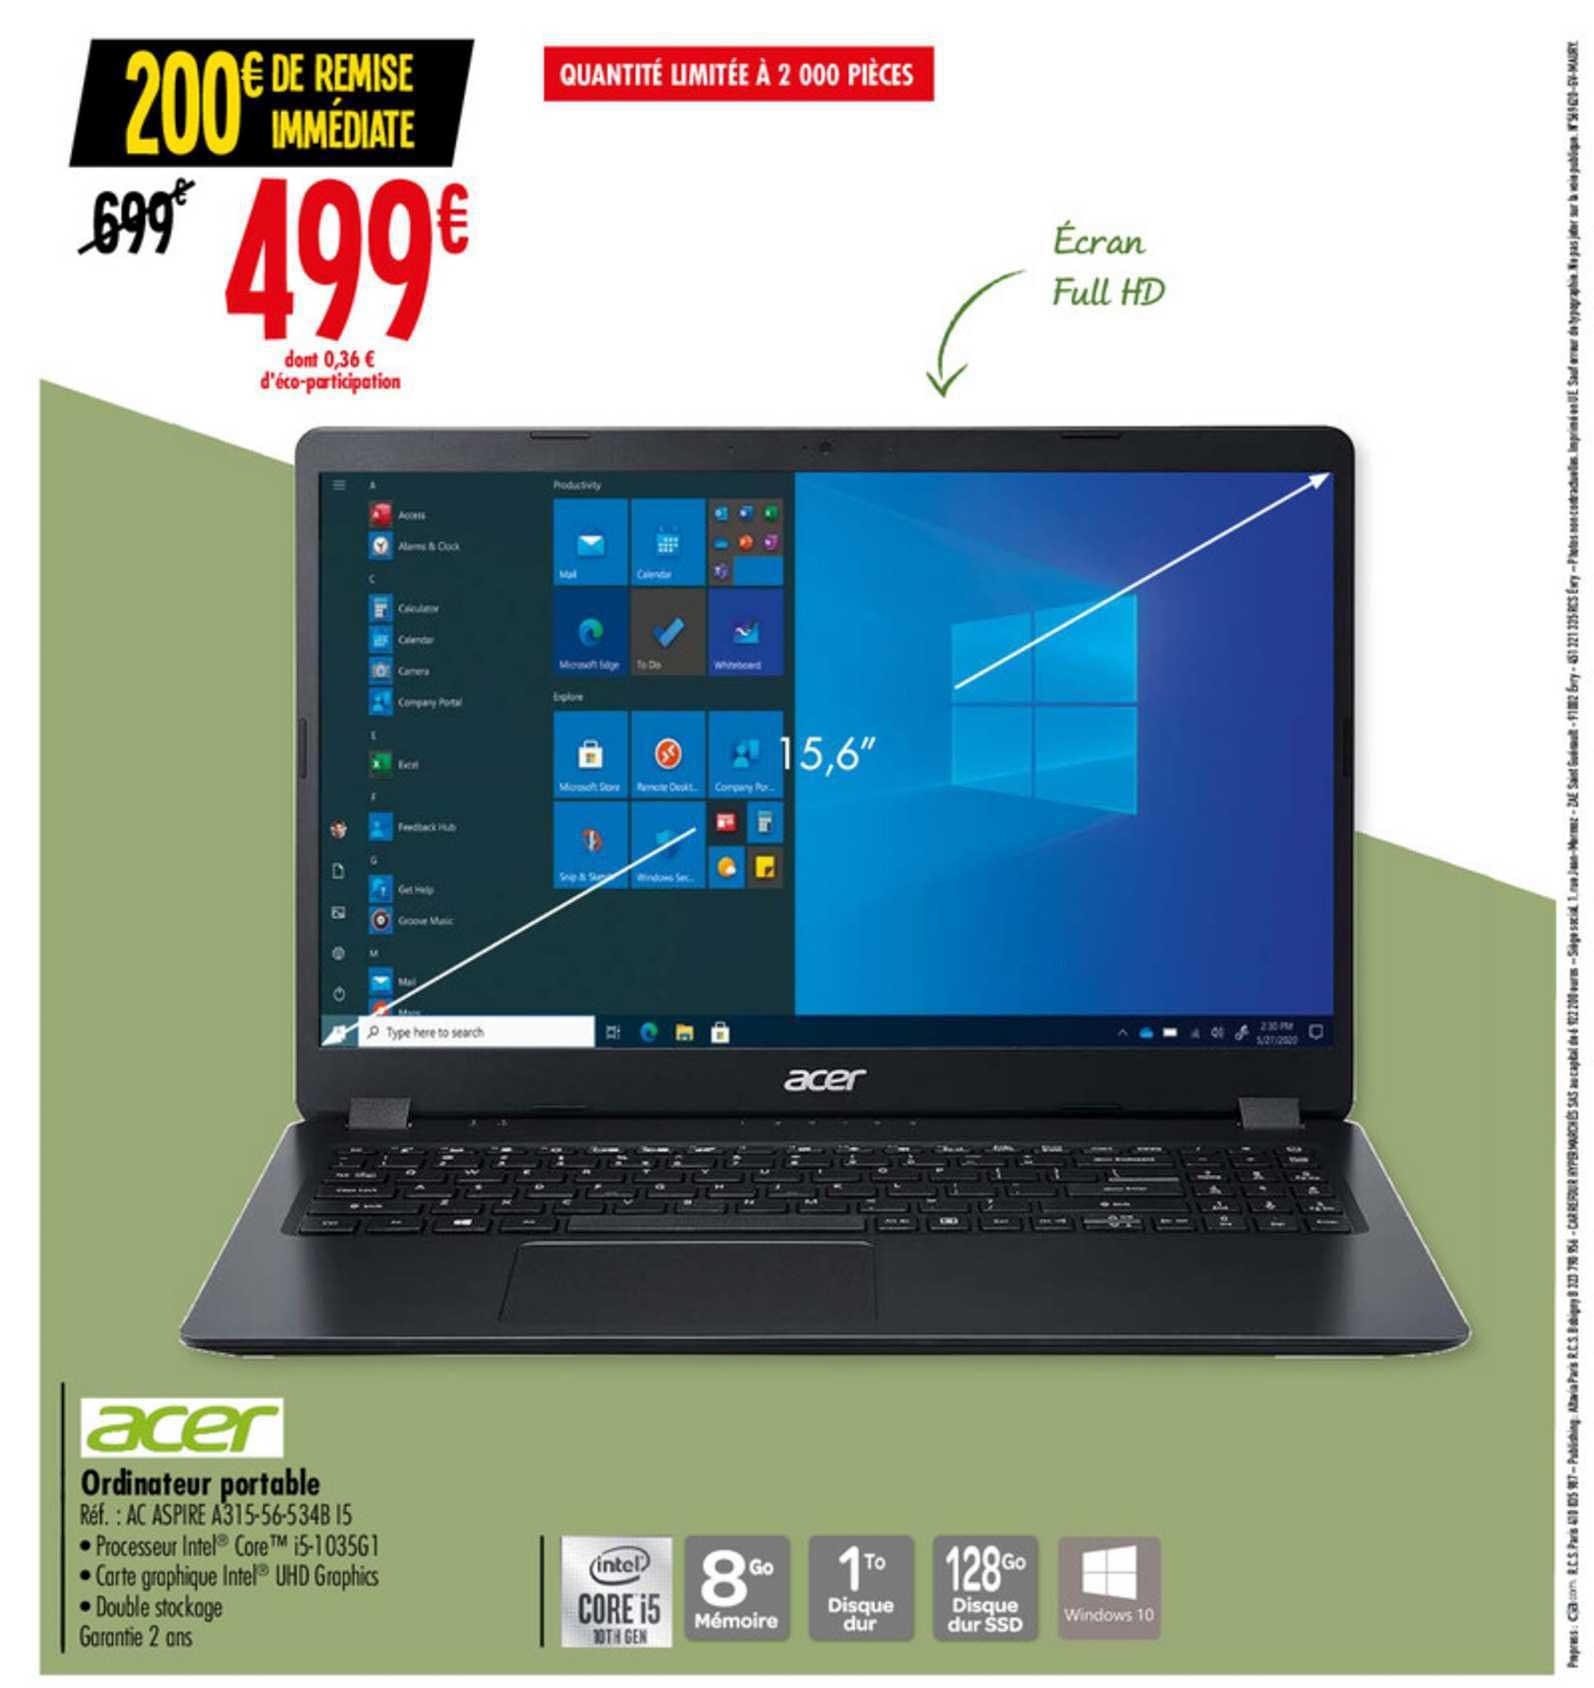 Carrefour Acer Ordinateur Portable Ac Aspire A315 56 534b I5